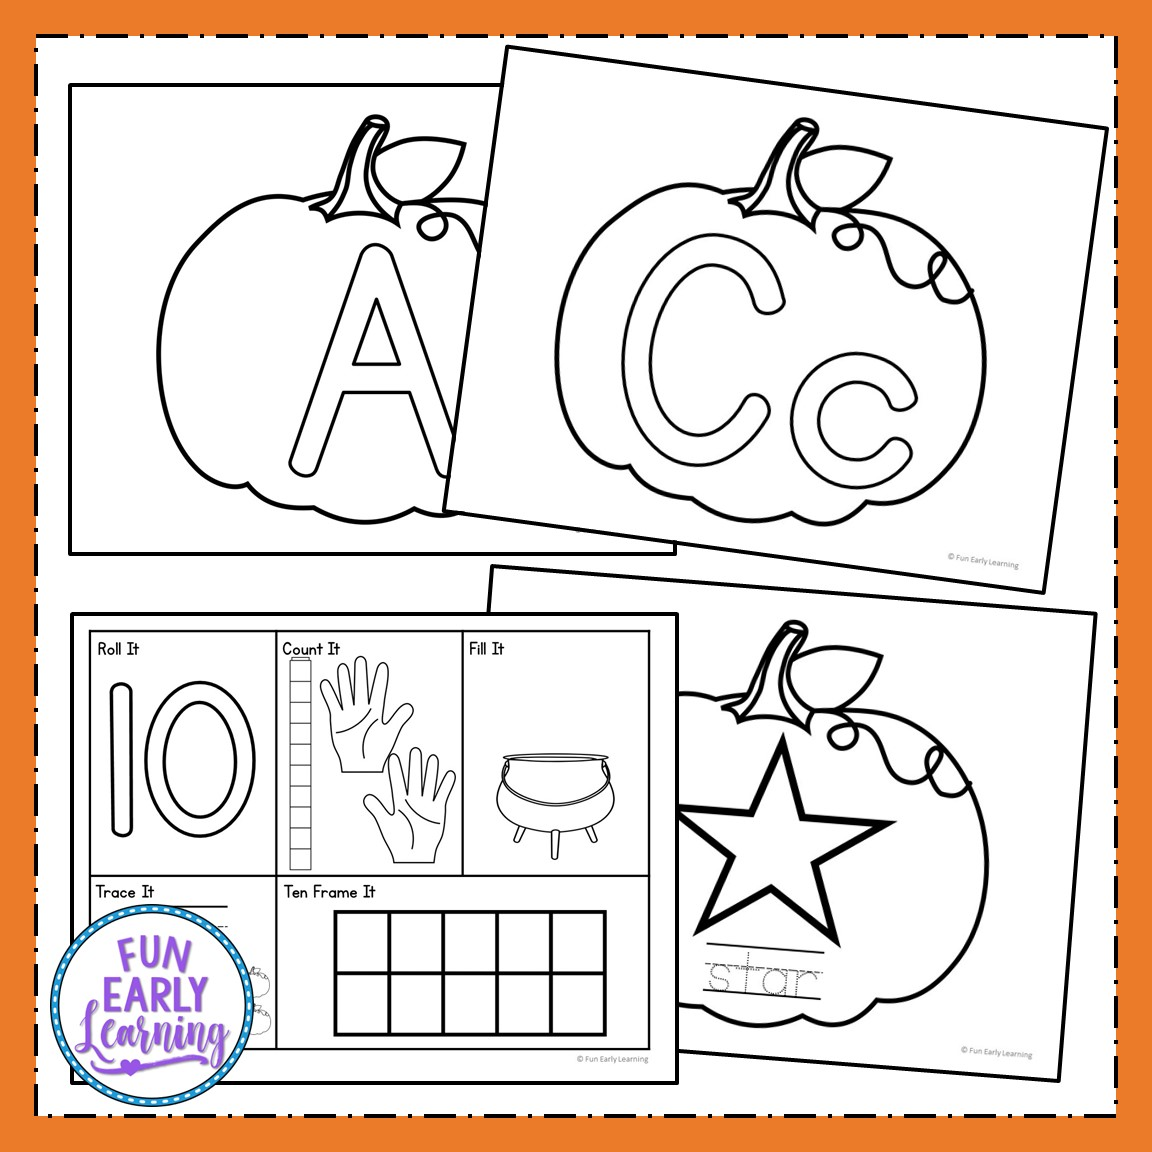 Play Dough Fun With Pumpkins Math And Literacy Activities